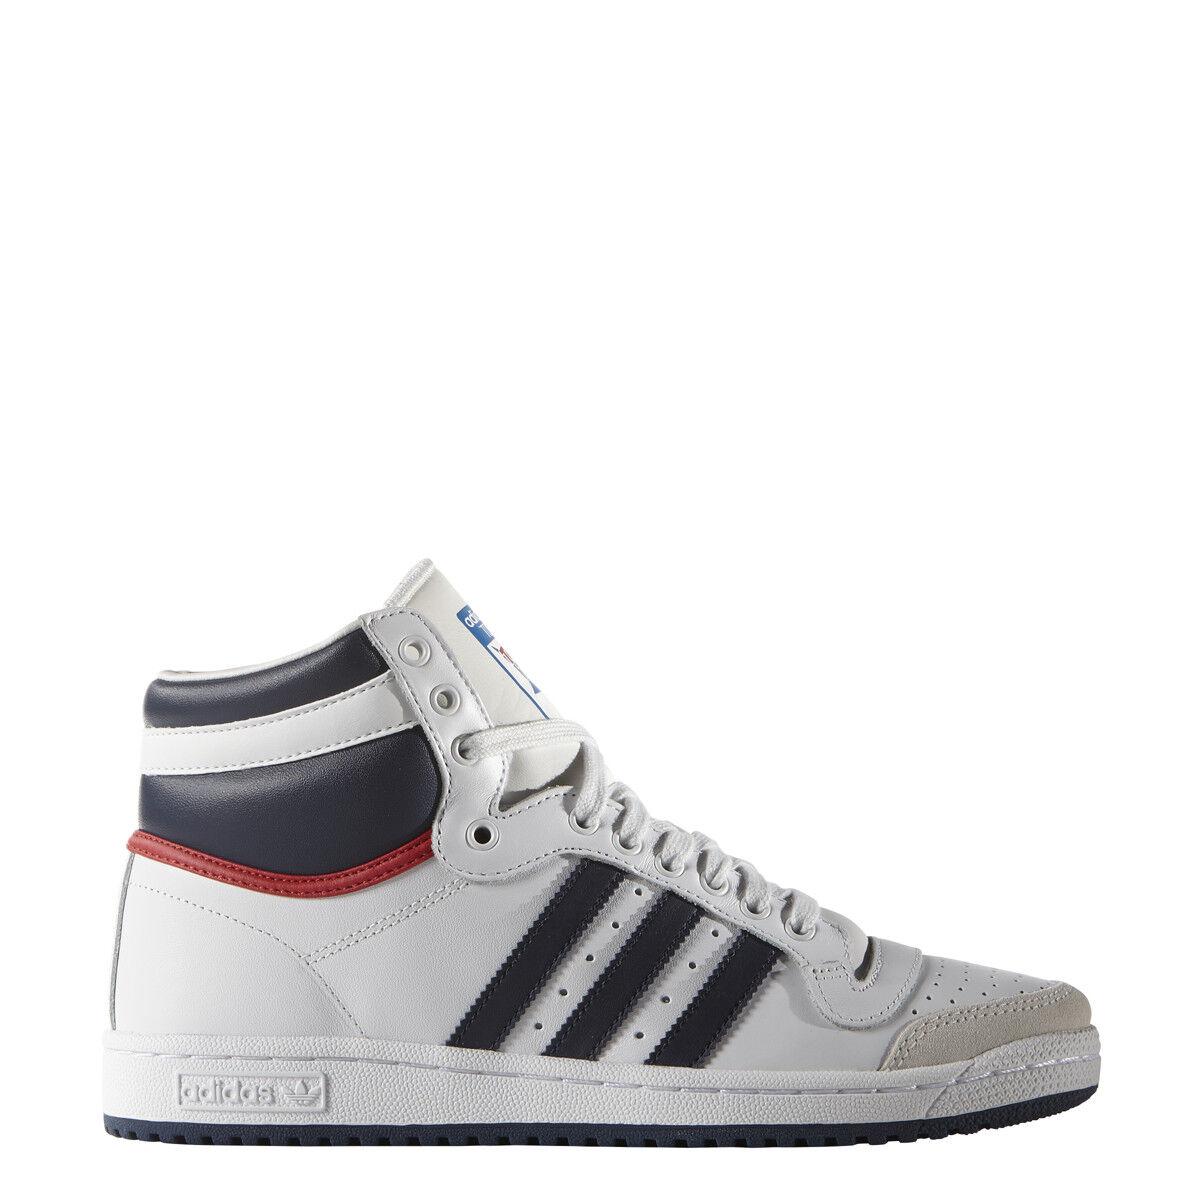 New Adidas Men's Originals Top Ten High OG shoes (D65161)  White    Navy-Red